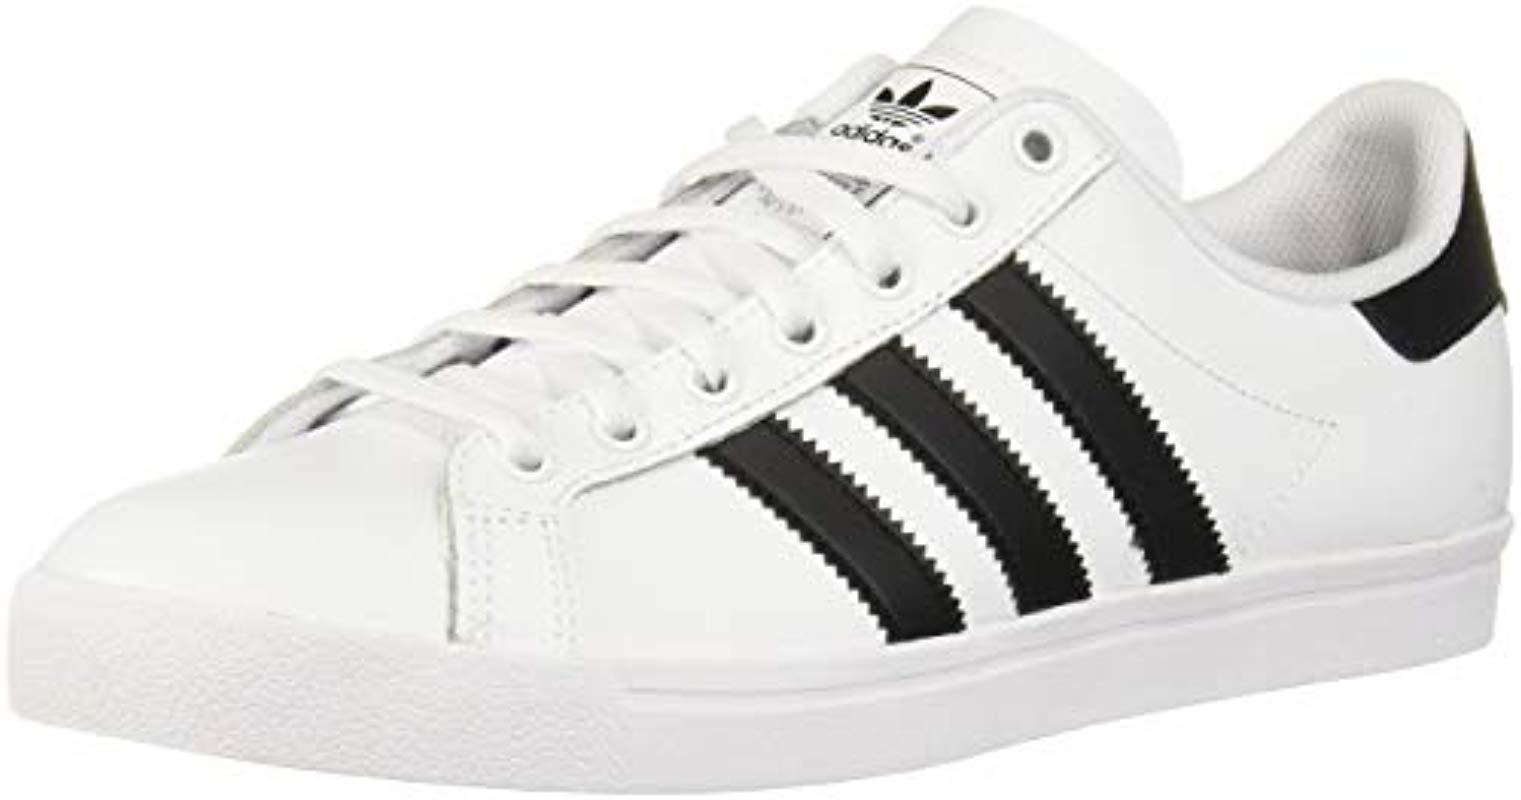 adidas Originals Lace Coast Star Sneaker in White, Black ...